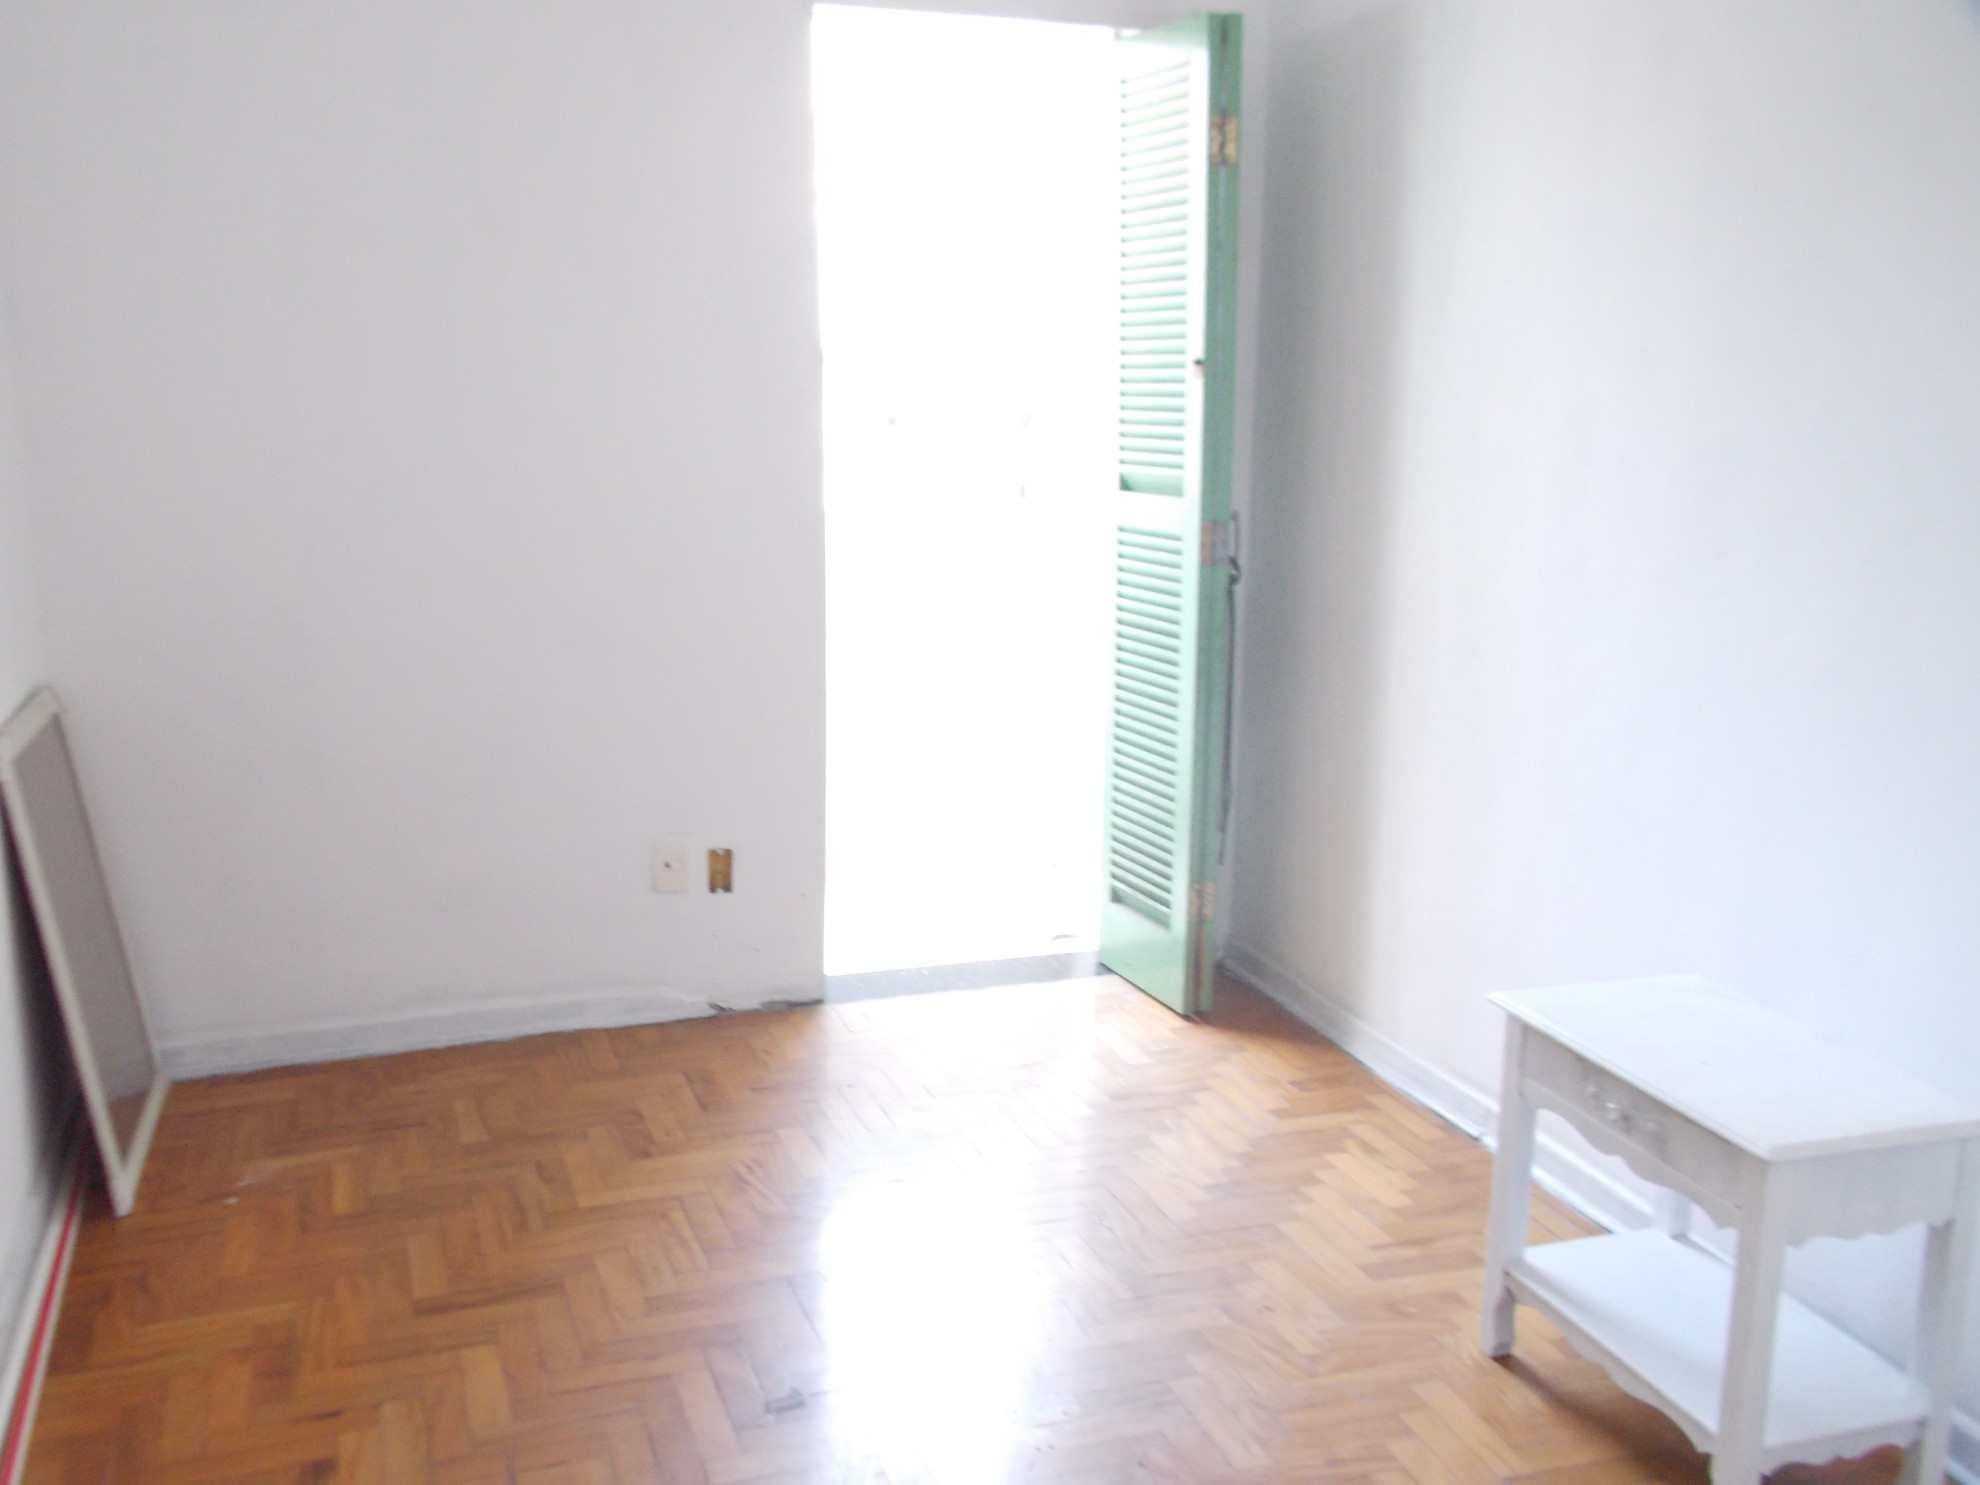 D - Dormitorio (2)